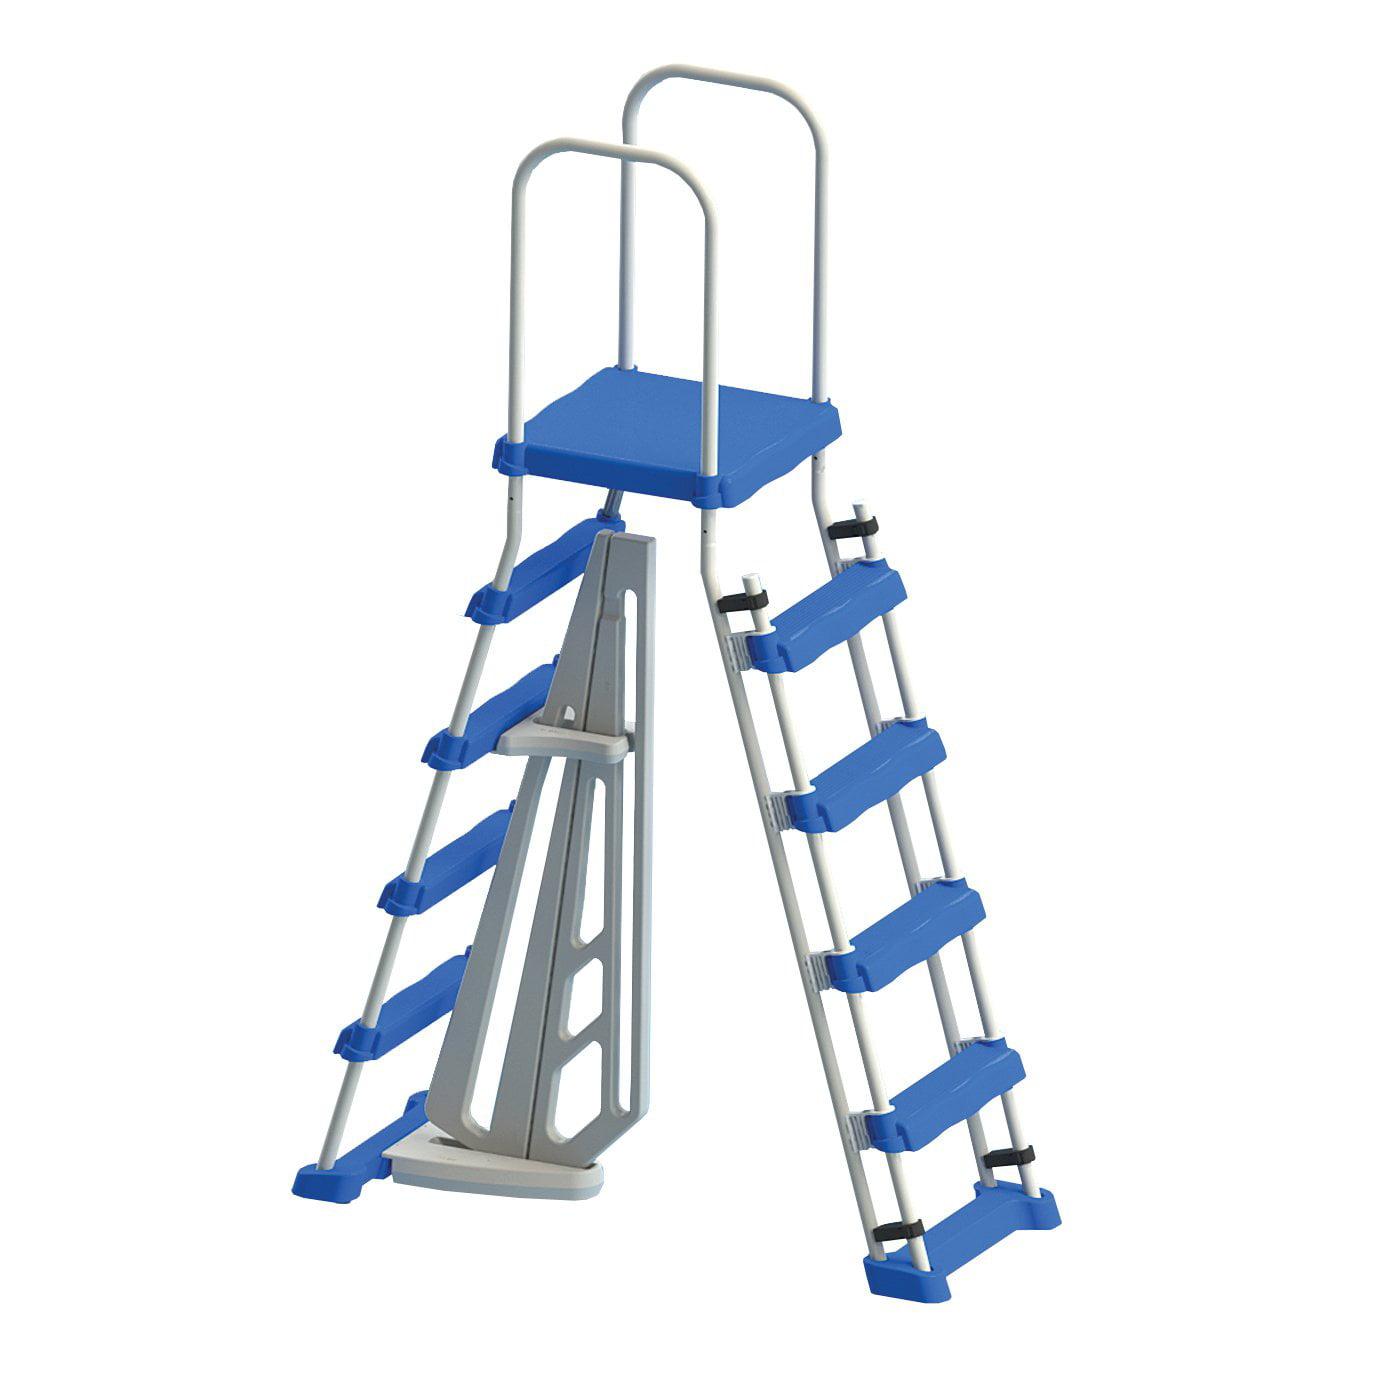 Swimline Above Ground Pool Entry Ladder